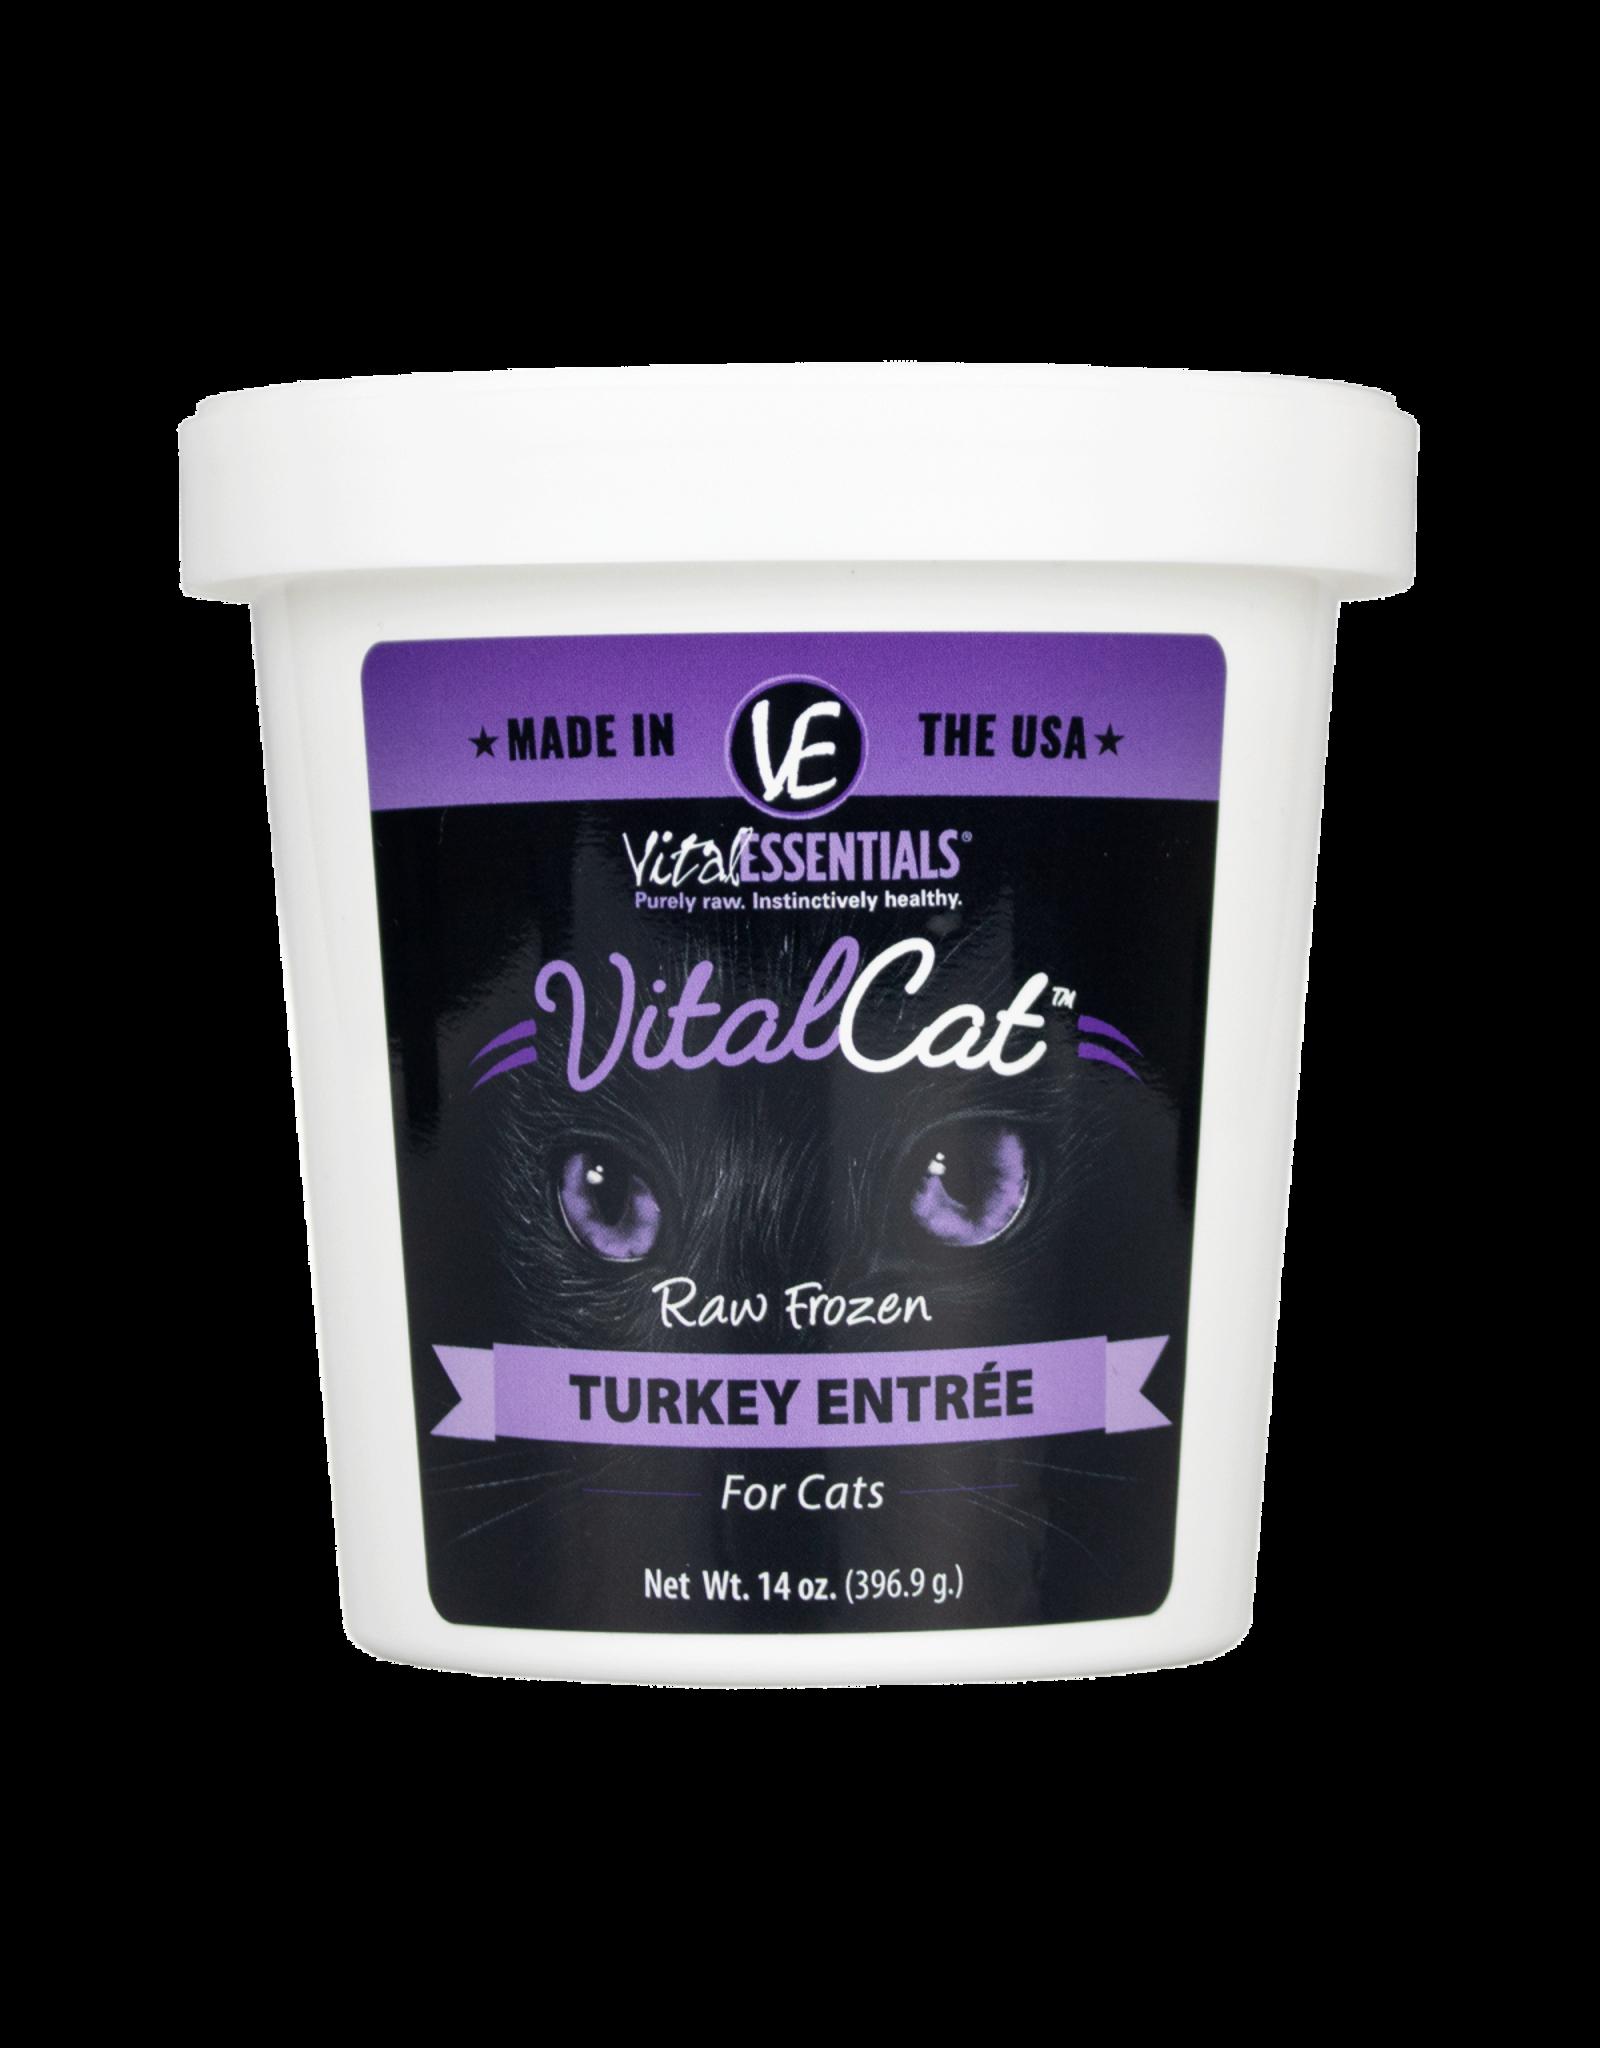 Vital Essentials VITAL CAT RAW FROZEN TURKEY ENTRÉE 14OZ TUB